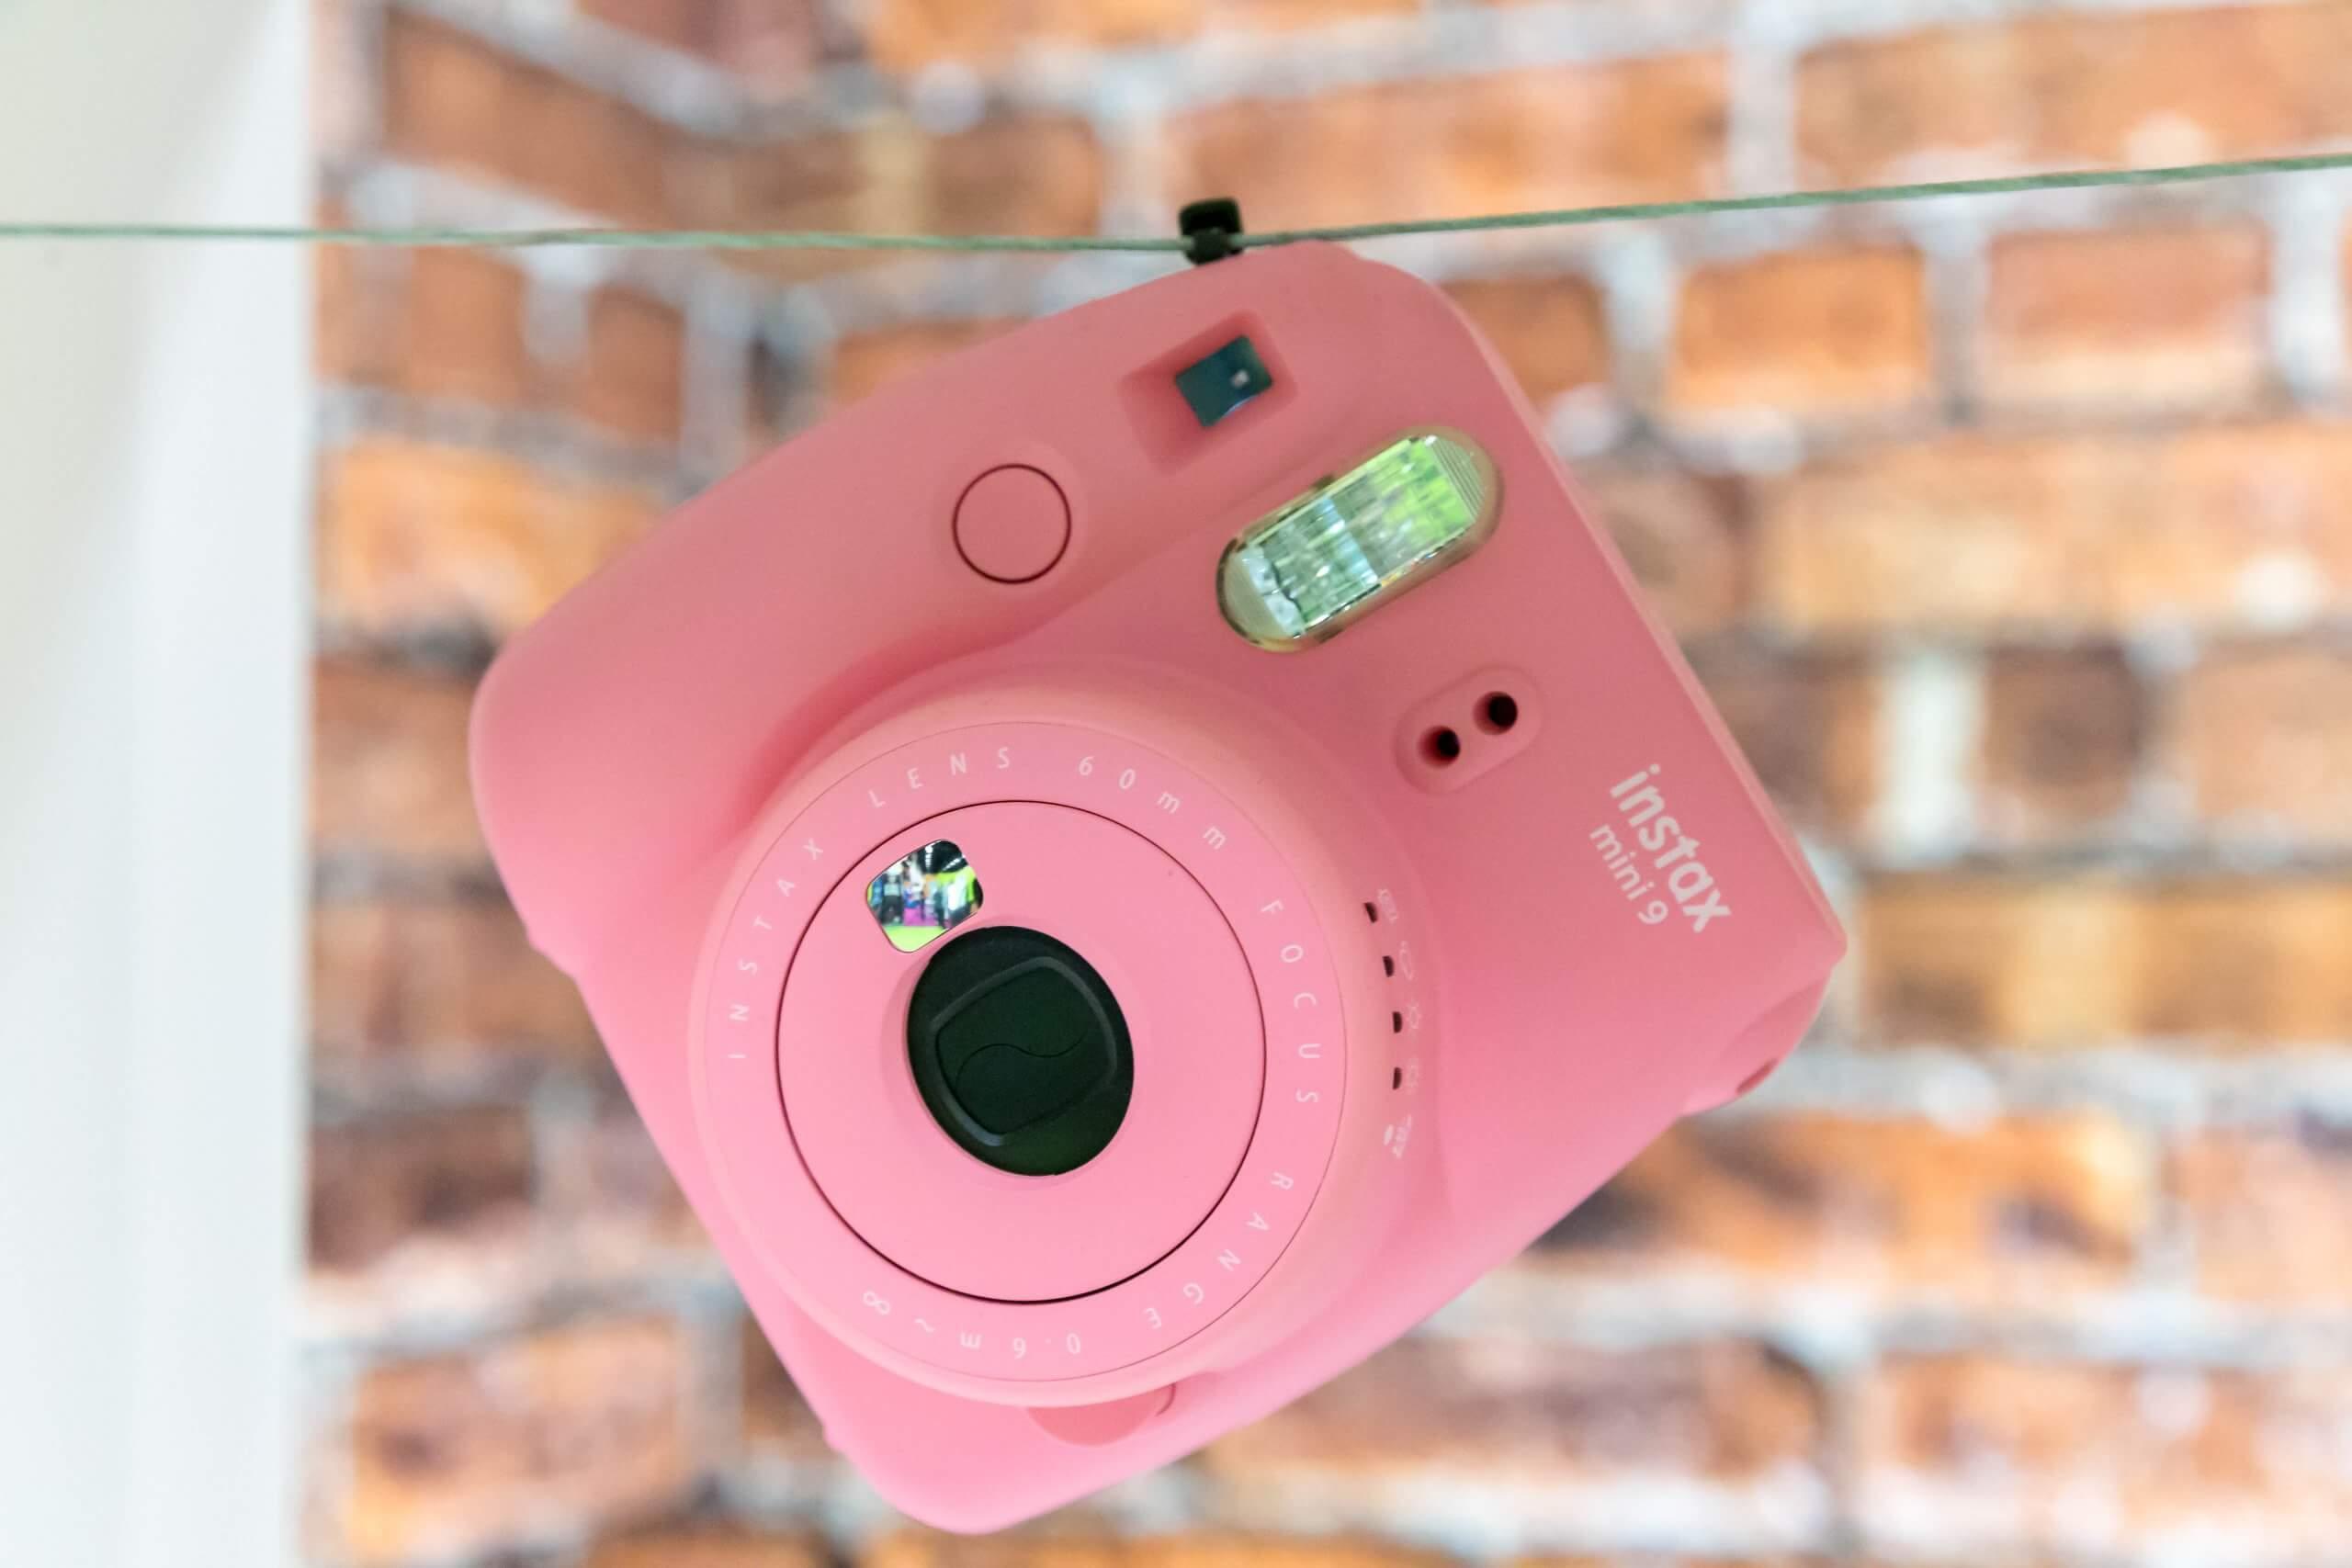 Sofortbildkameras – den Moment festhalten